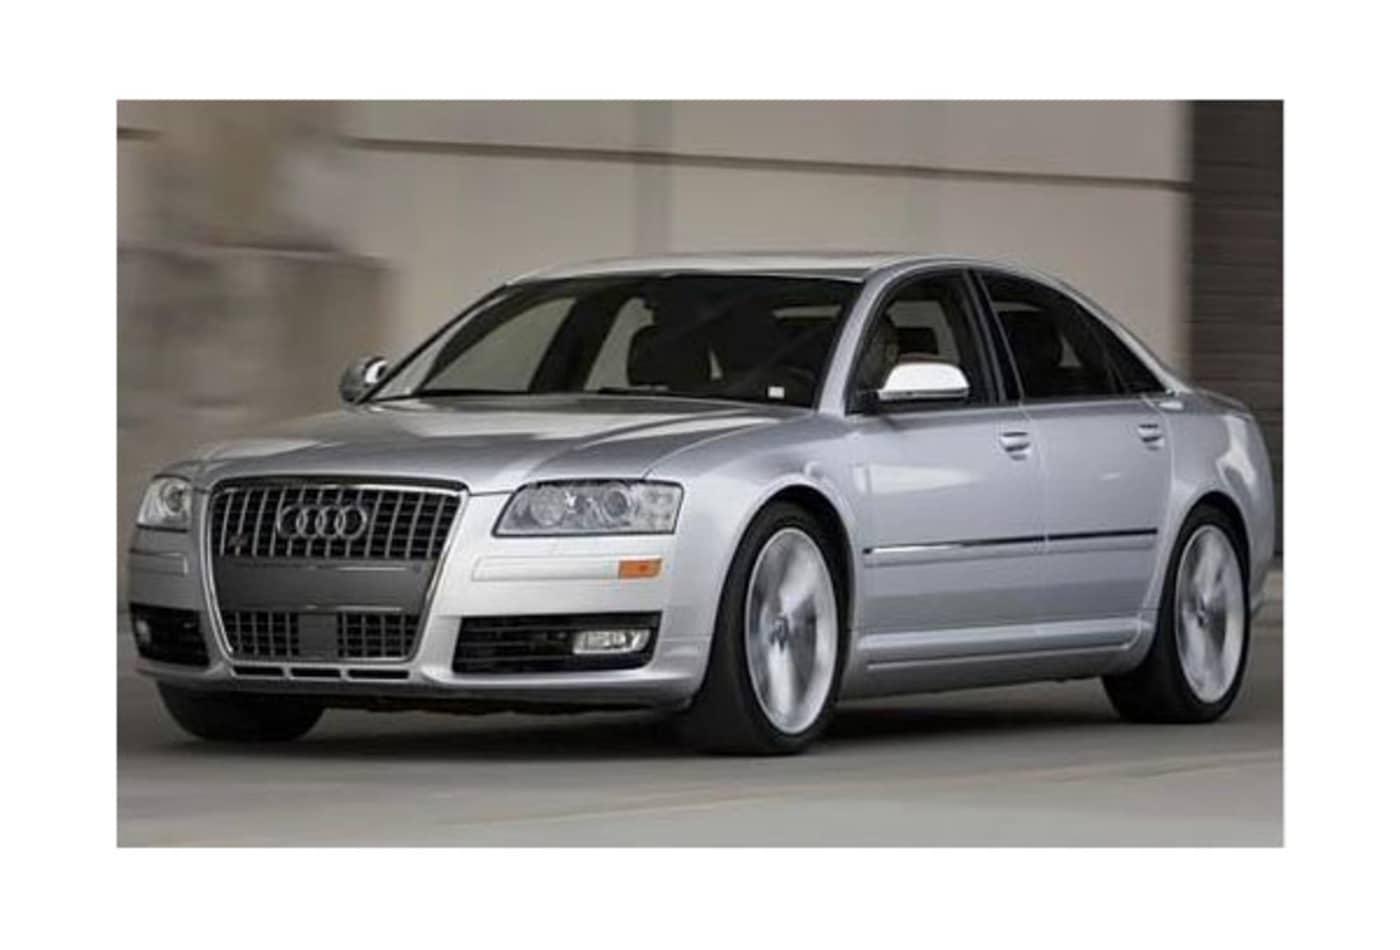 Audi-S8-Most-Stolen-Luxury-Cars-CNBC.jpg